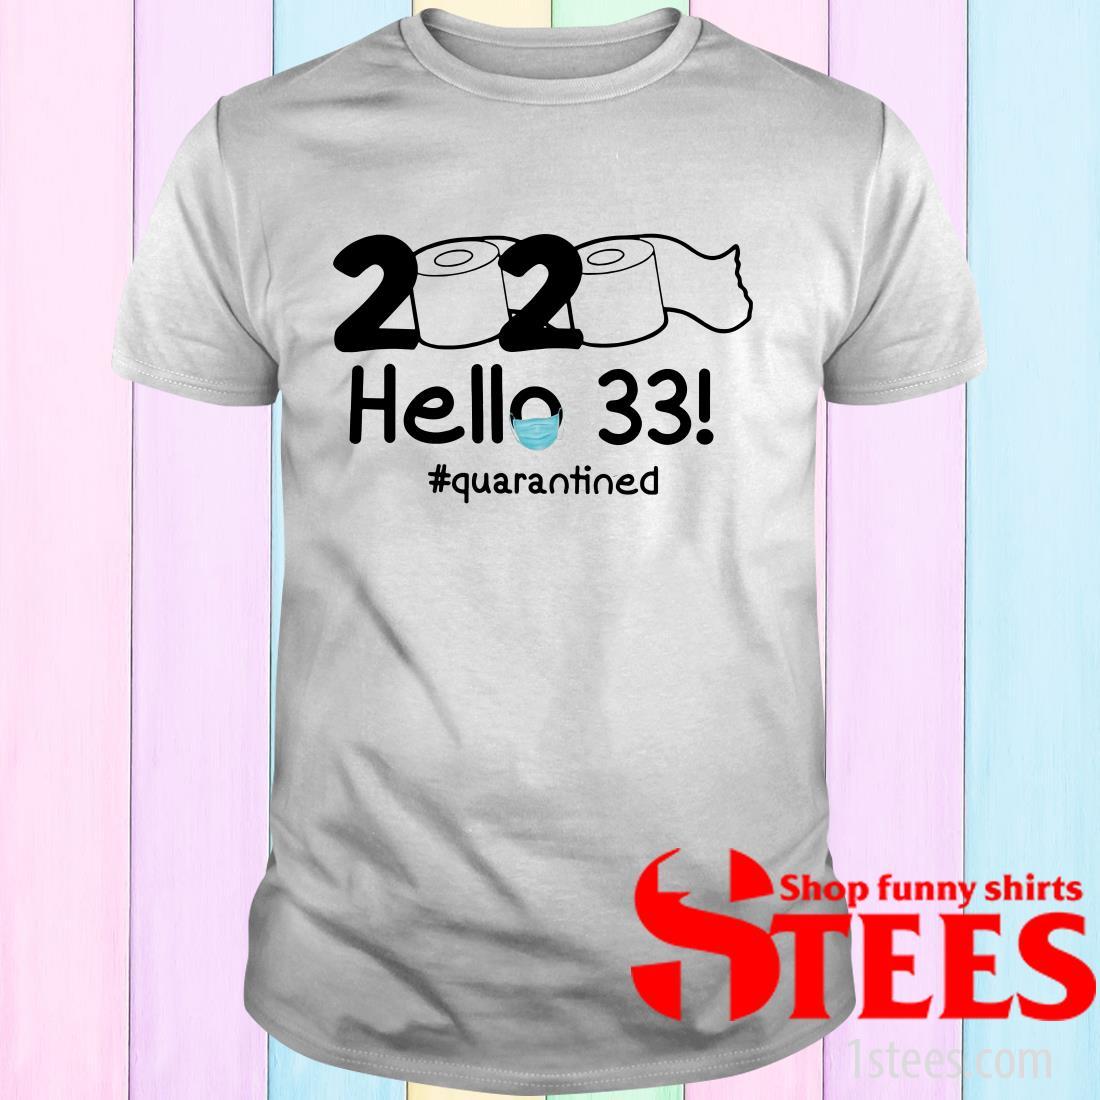 2020 Hello 33 #Quarantined Shirt